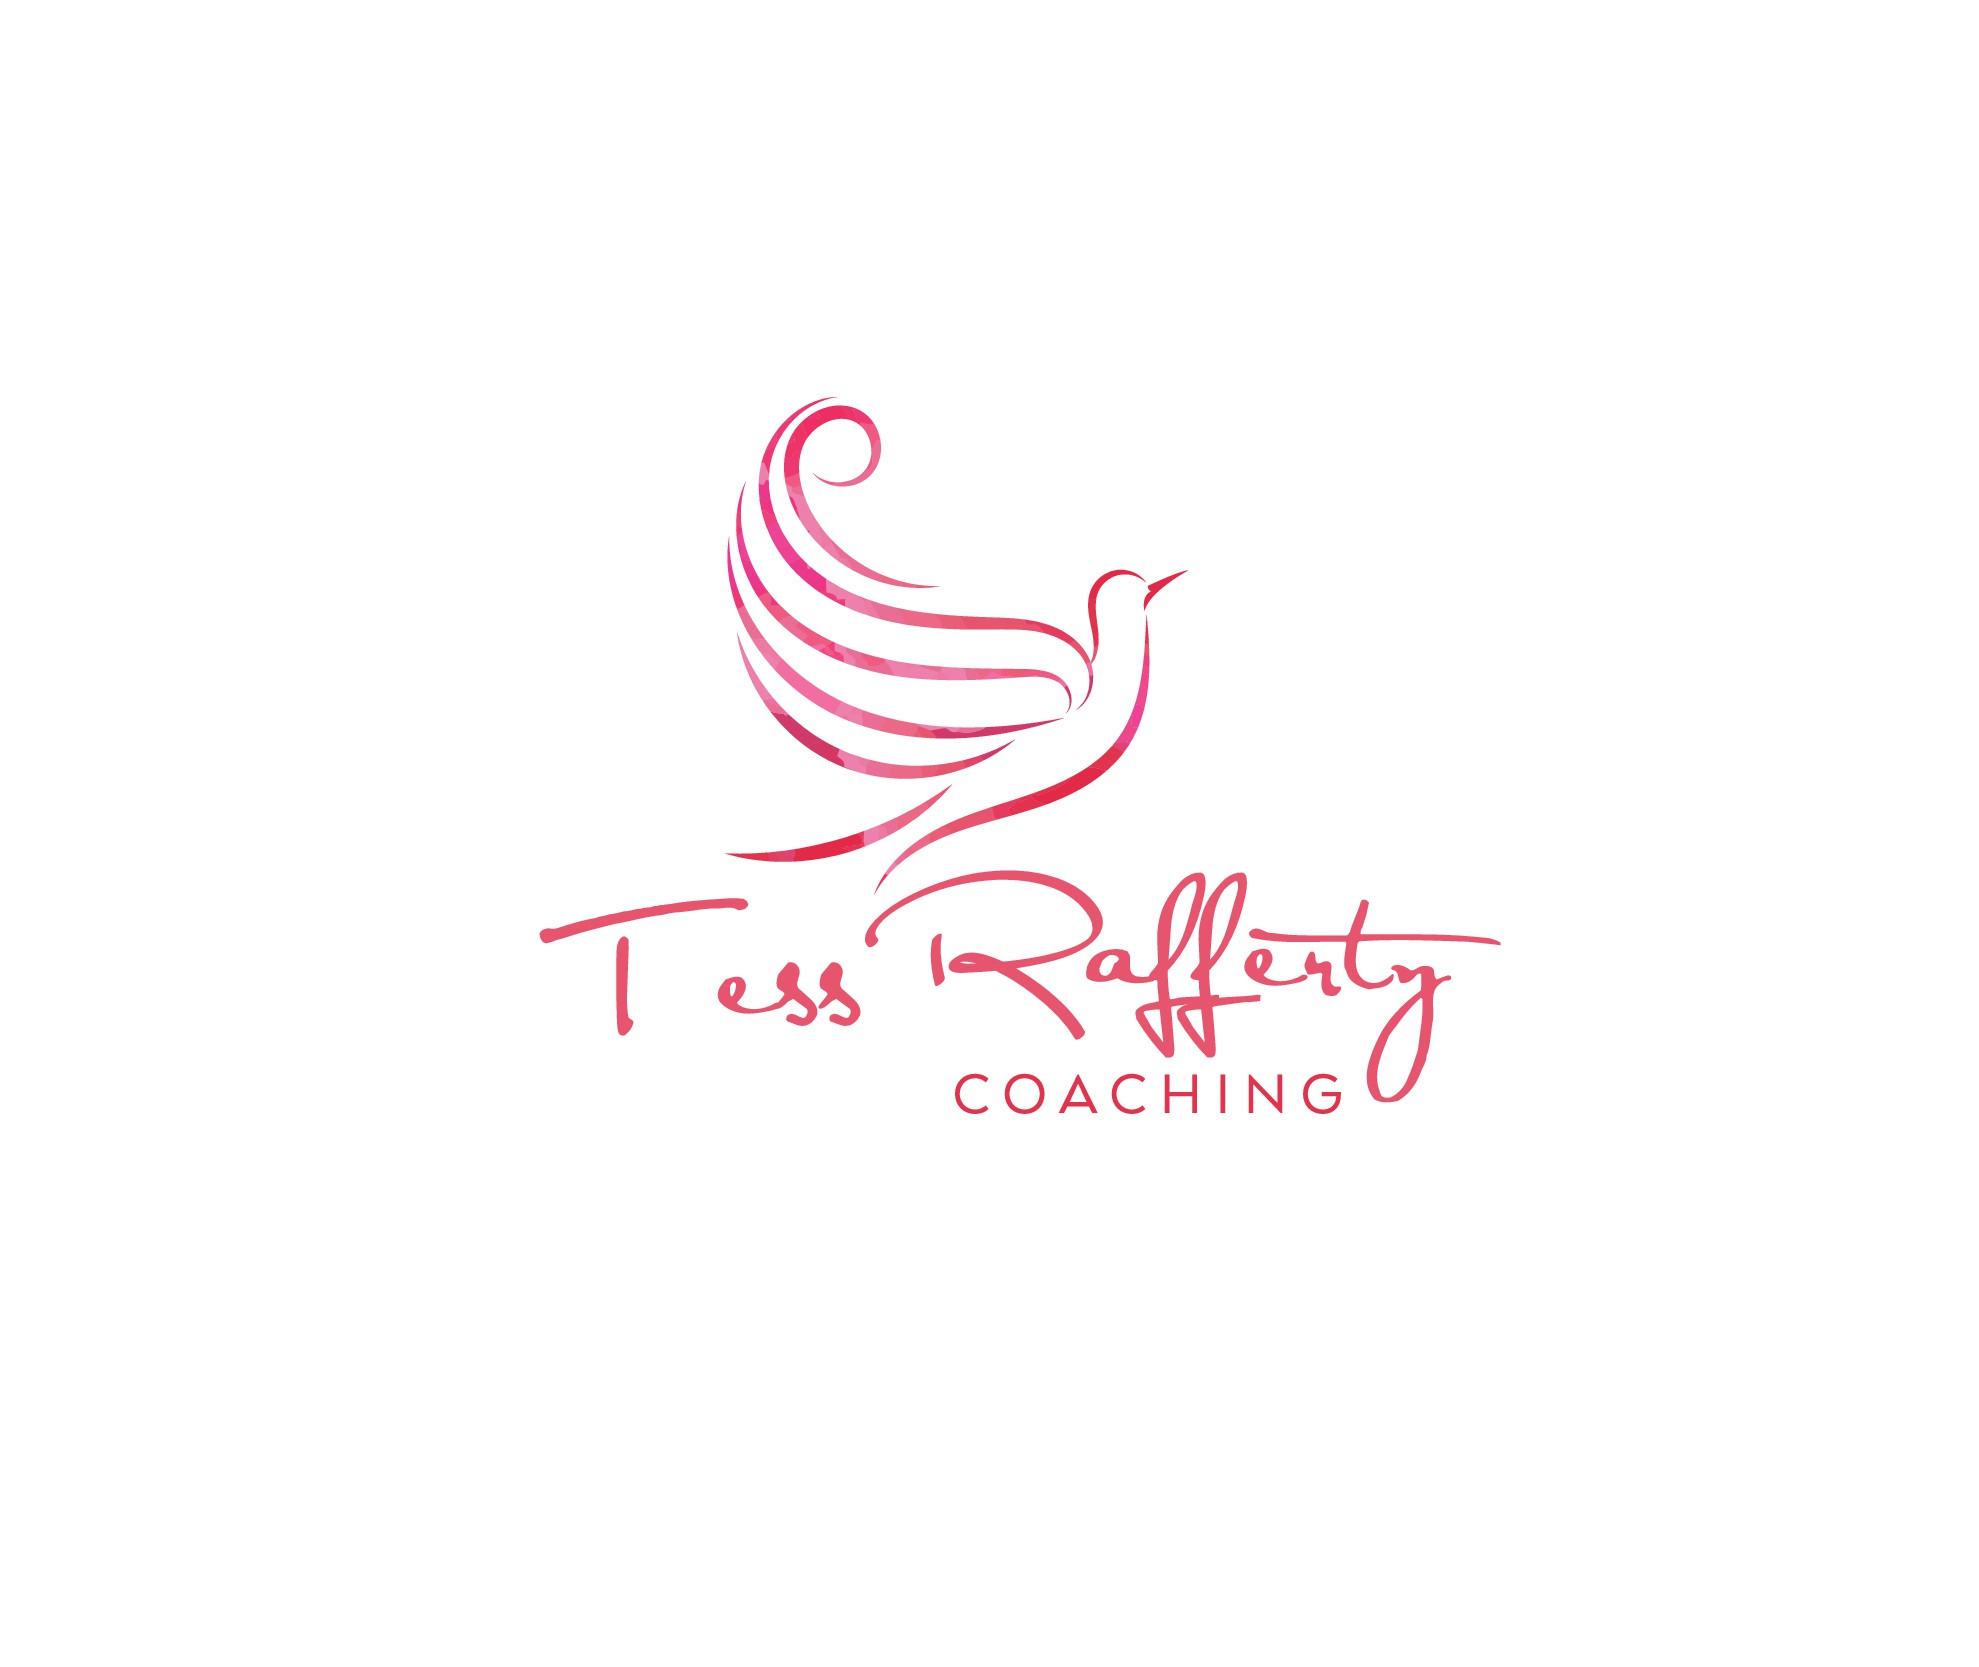 Personal empowerment coach logo!